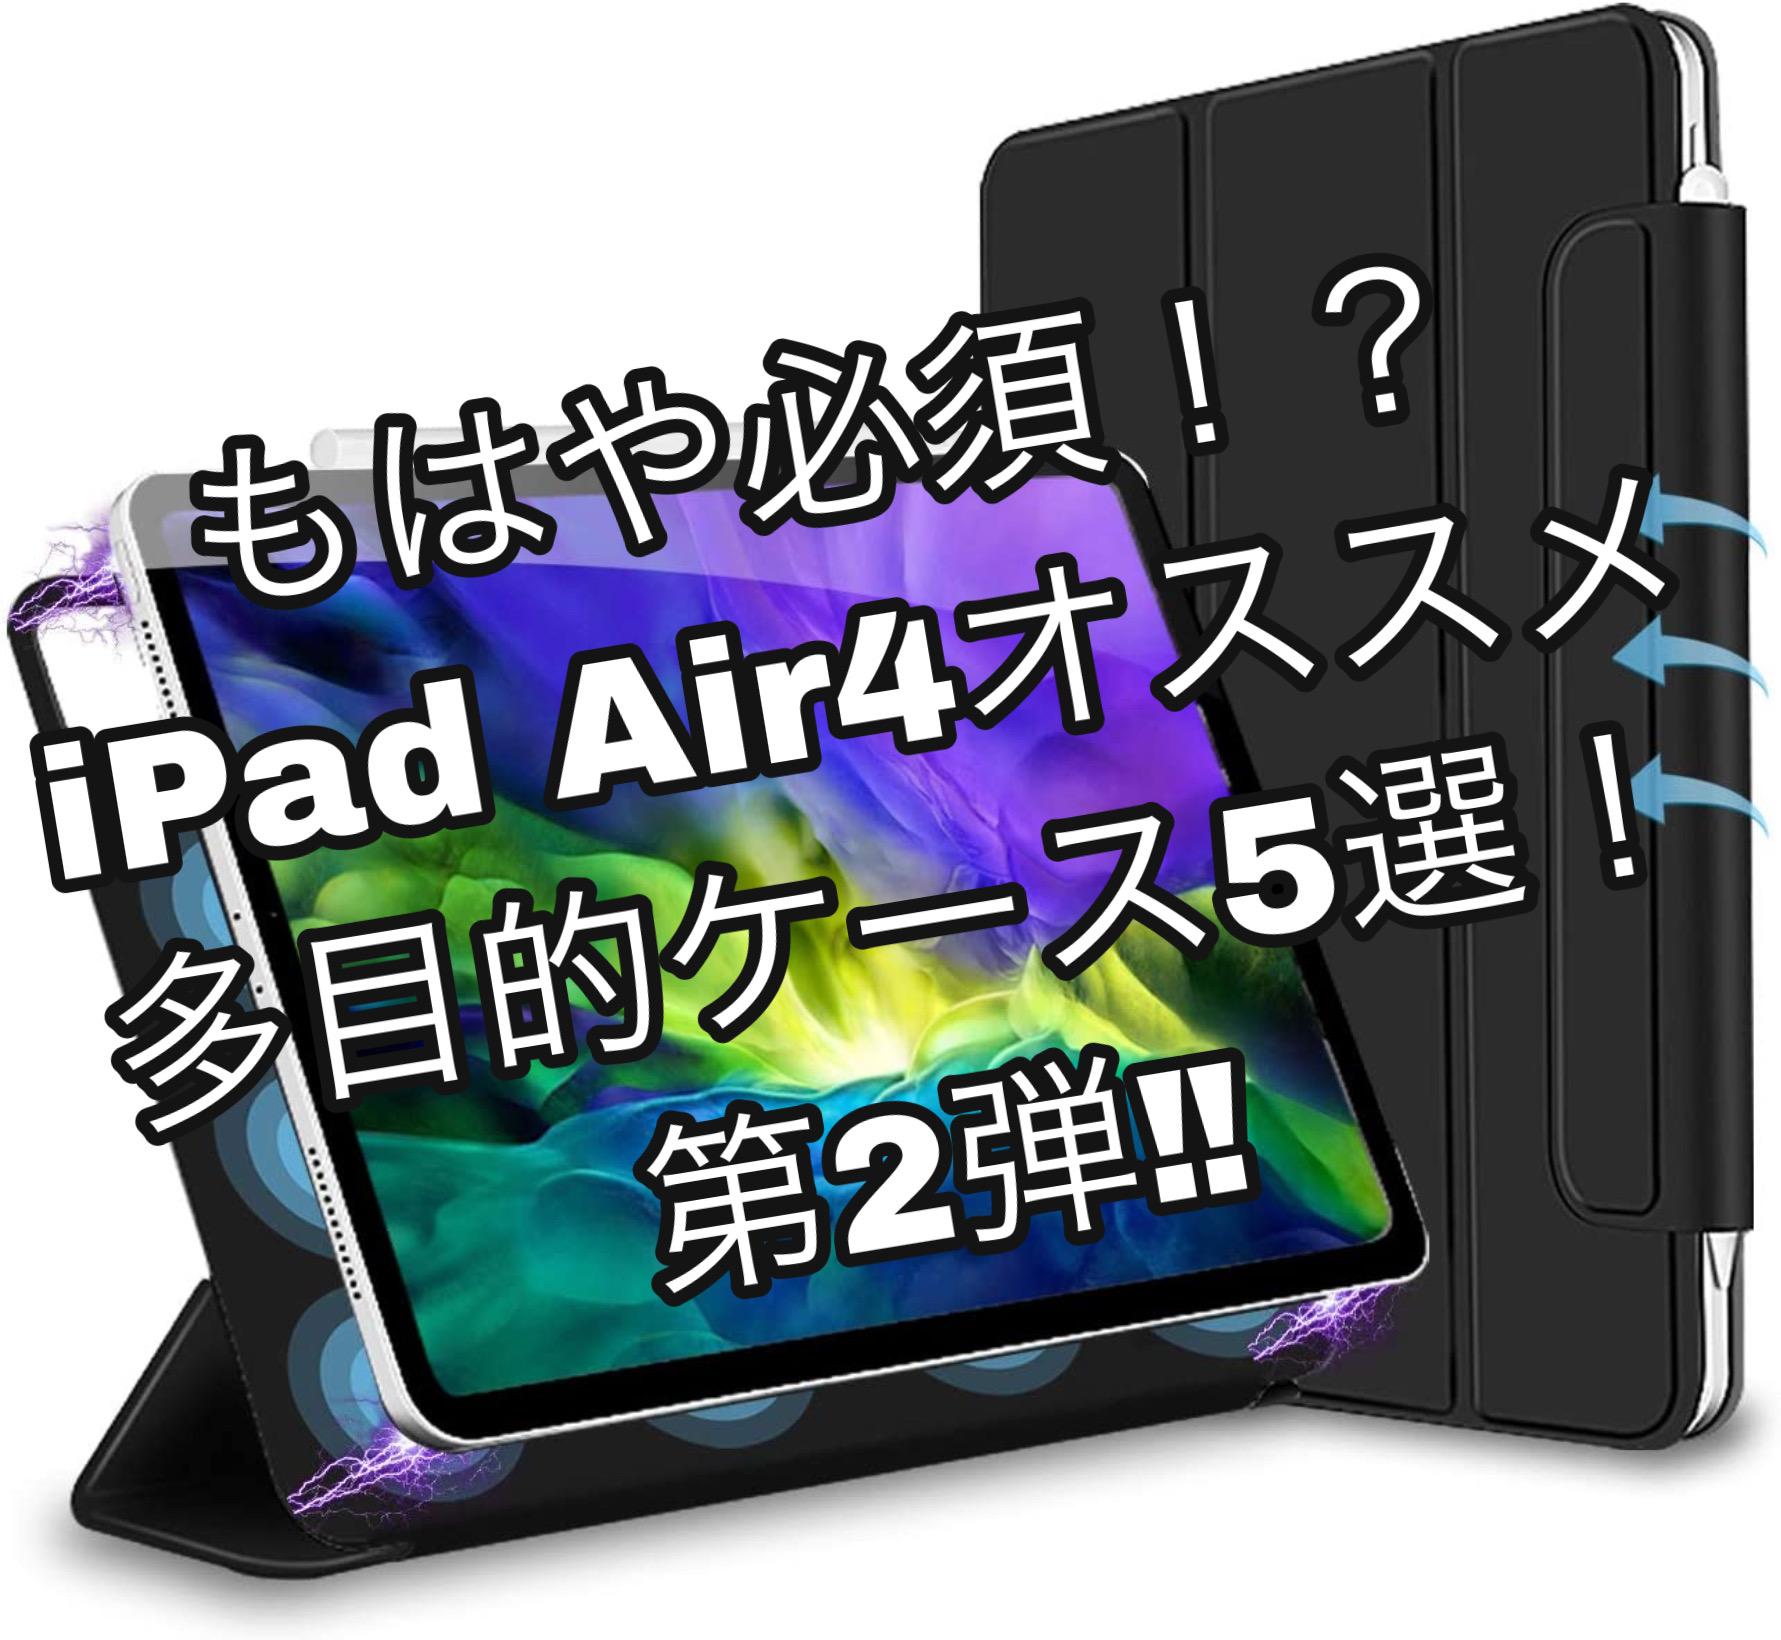 iPad Air4のケース紹介